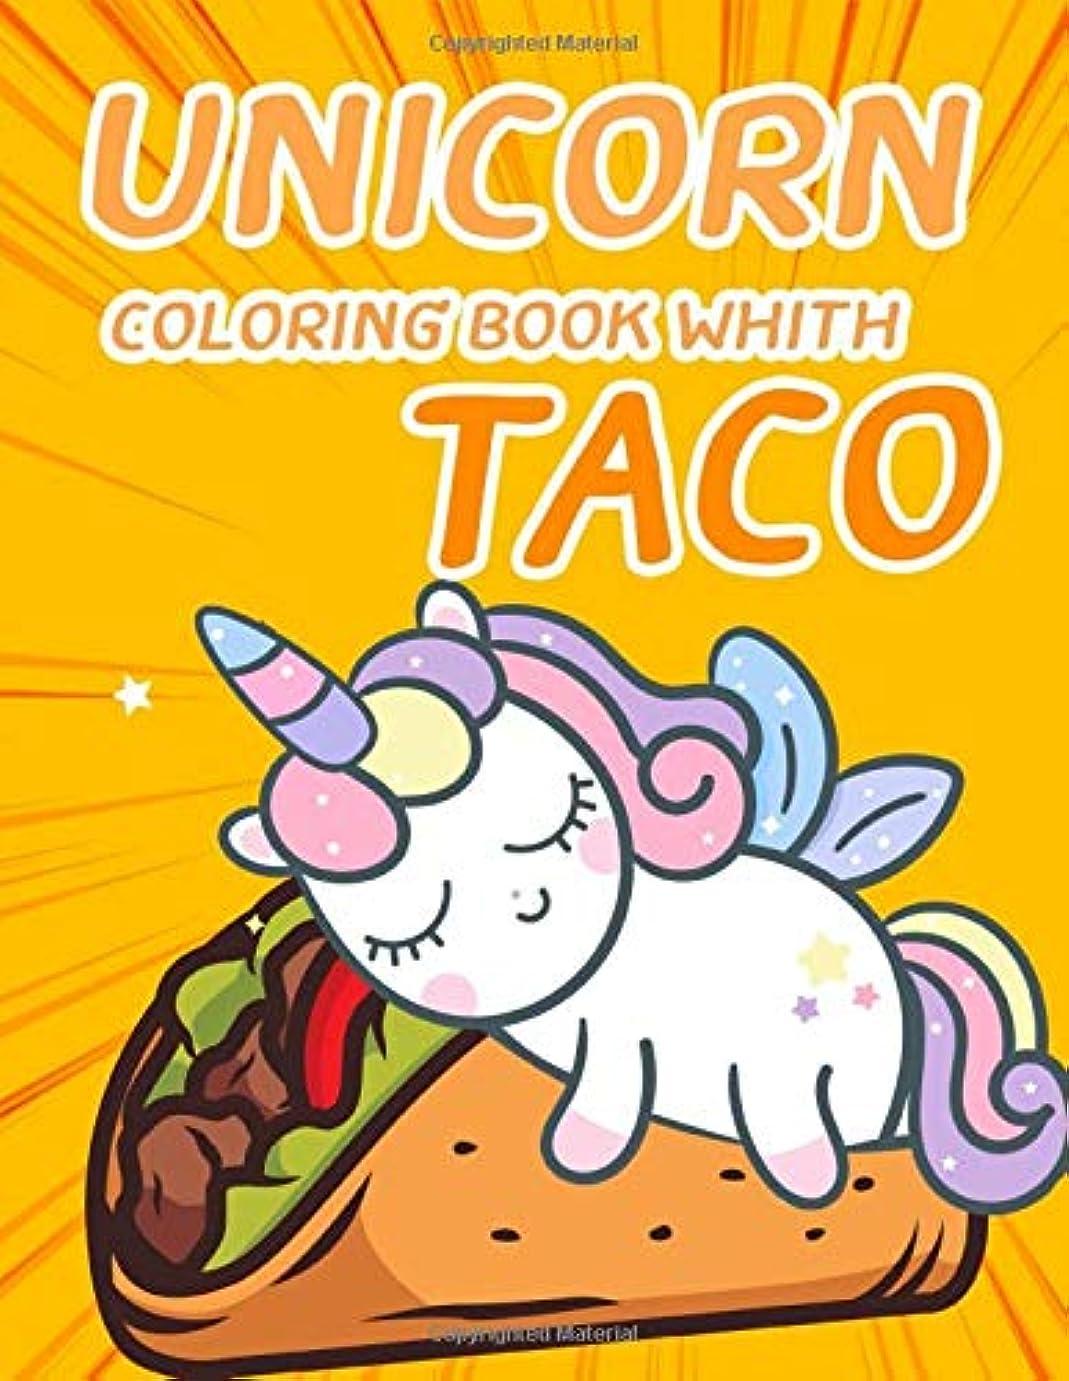 忍耐補正仲間、同僚UNICORN COLORING BOOK WITH TACO: Unconscious unicornpreneur unicorn coloring book